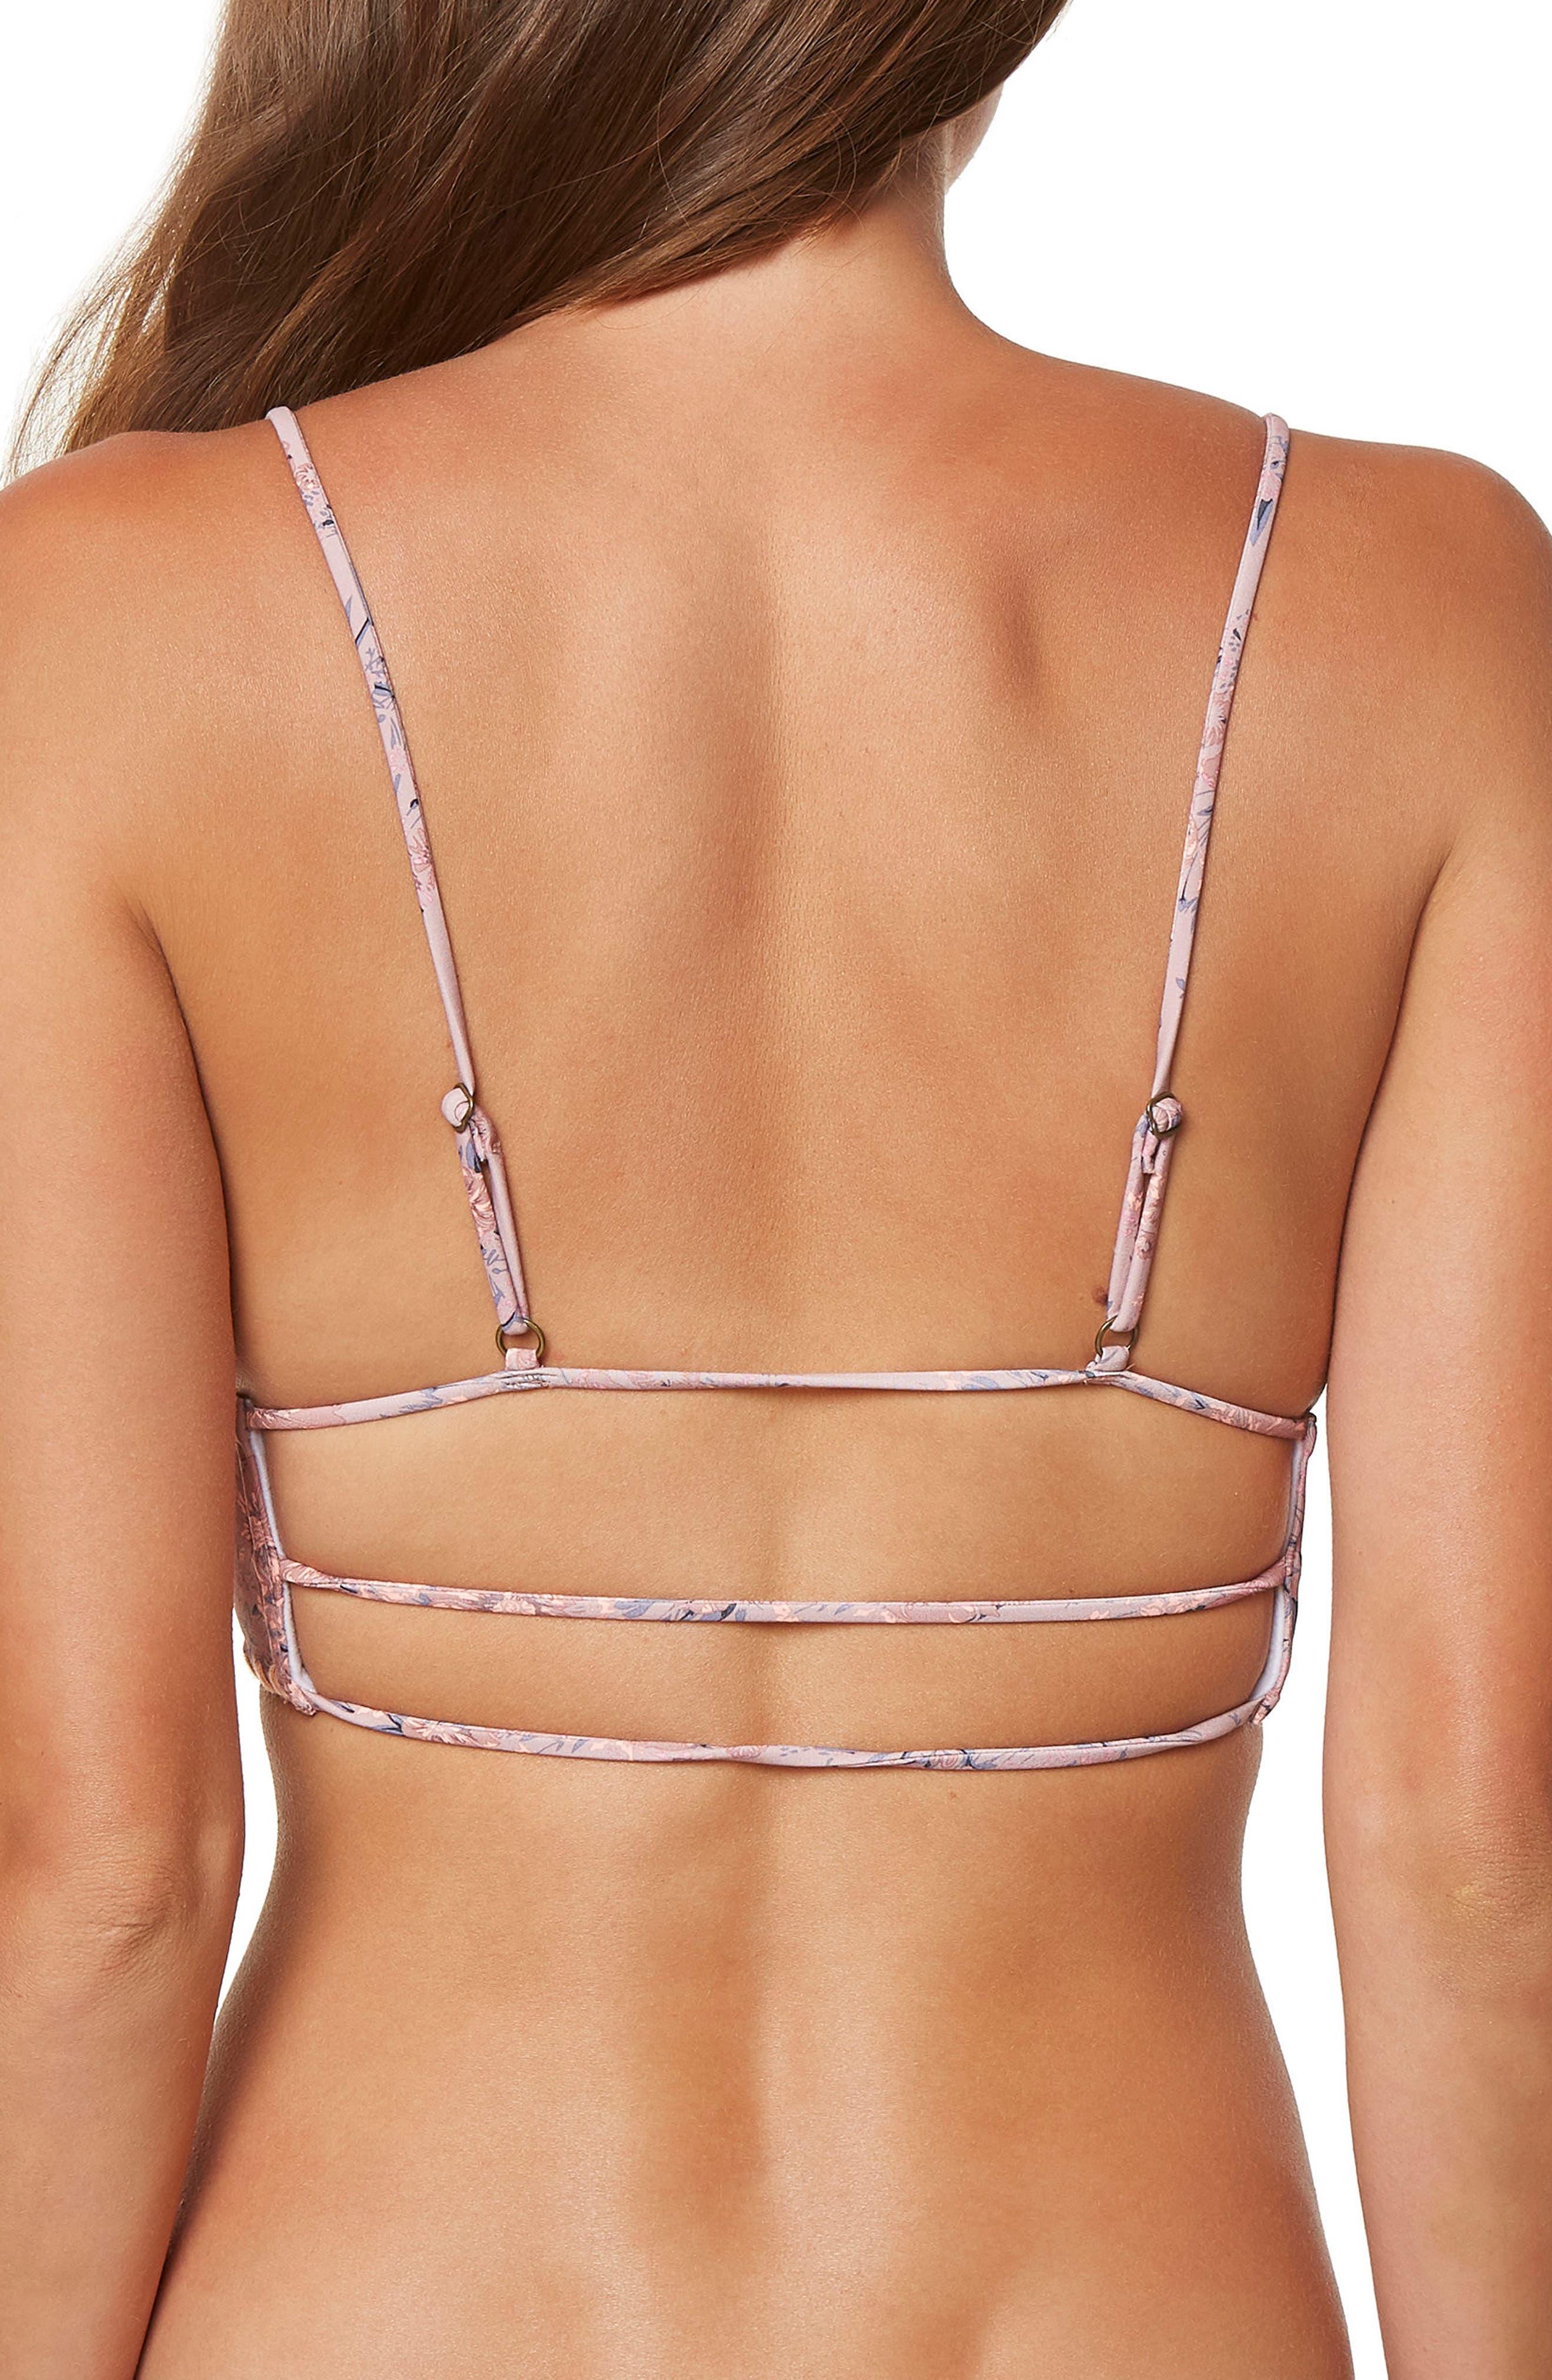 Alternate Image 2  - O'Neill Calvin Bralette Bikini Top